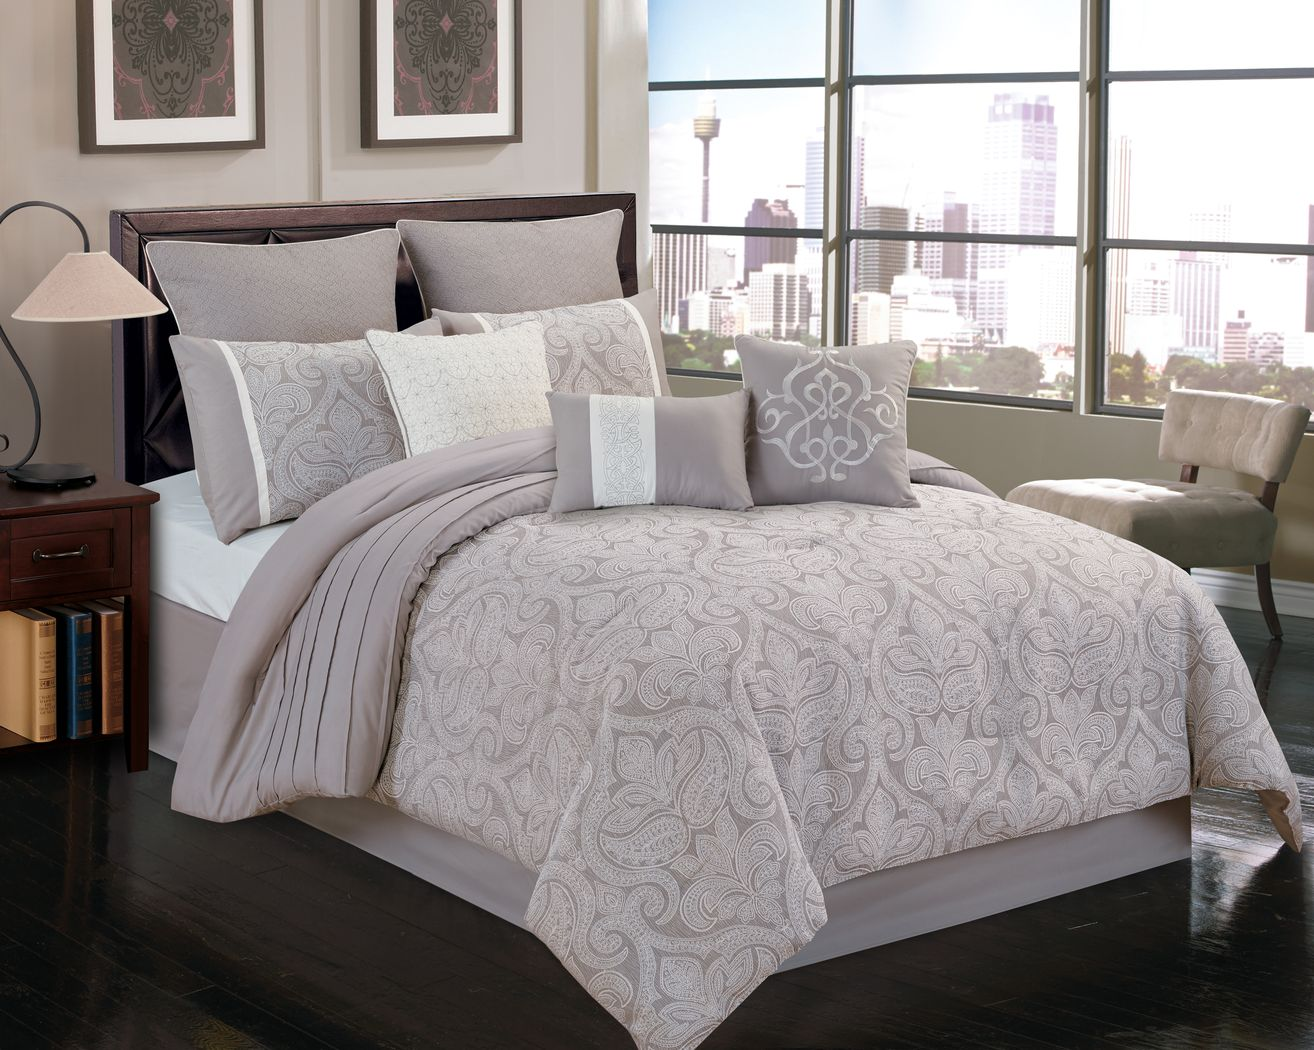 Shaila Gray 10 Pc King Comforter Set